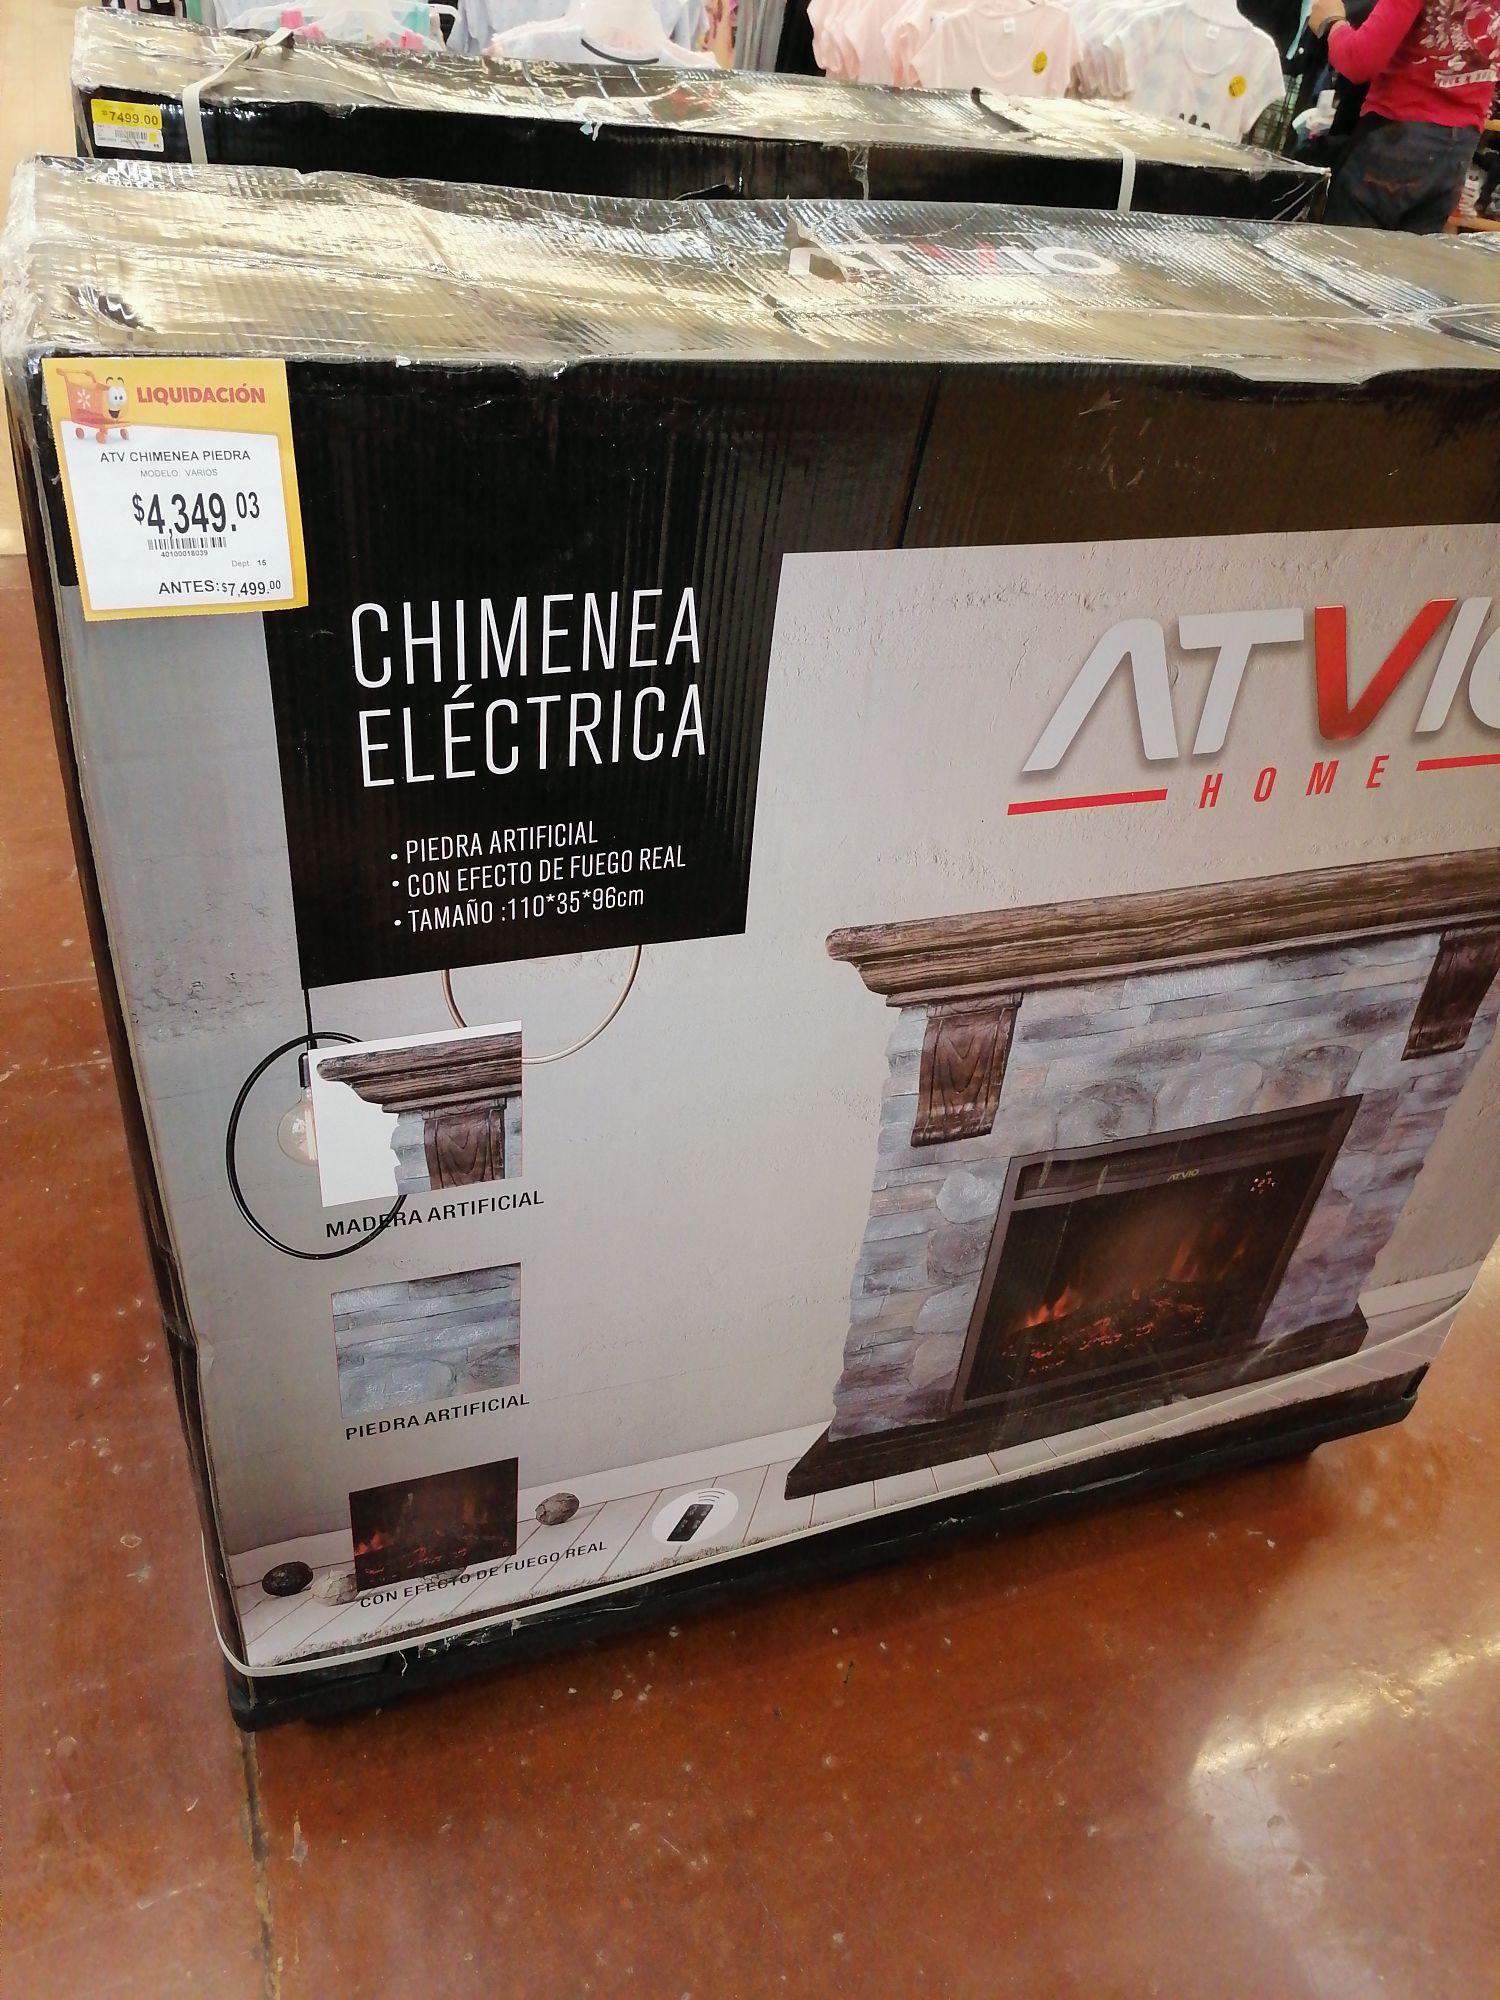 Walmart: Chimenea Electrica